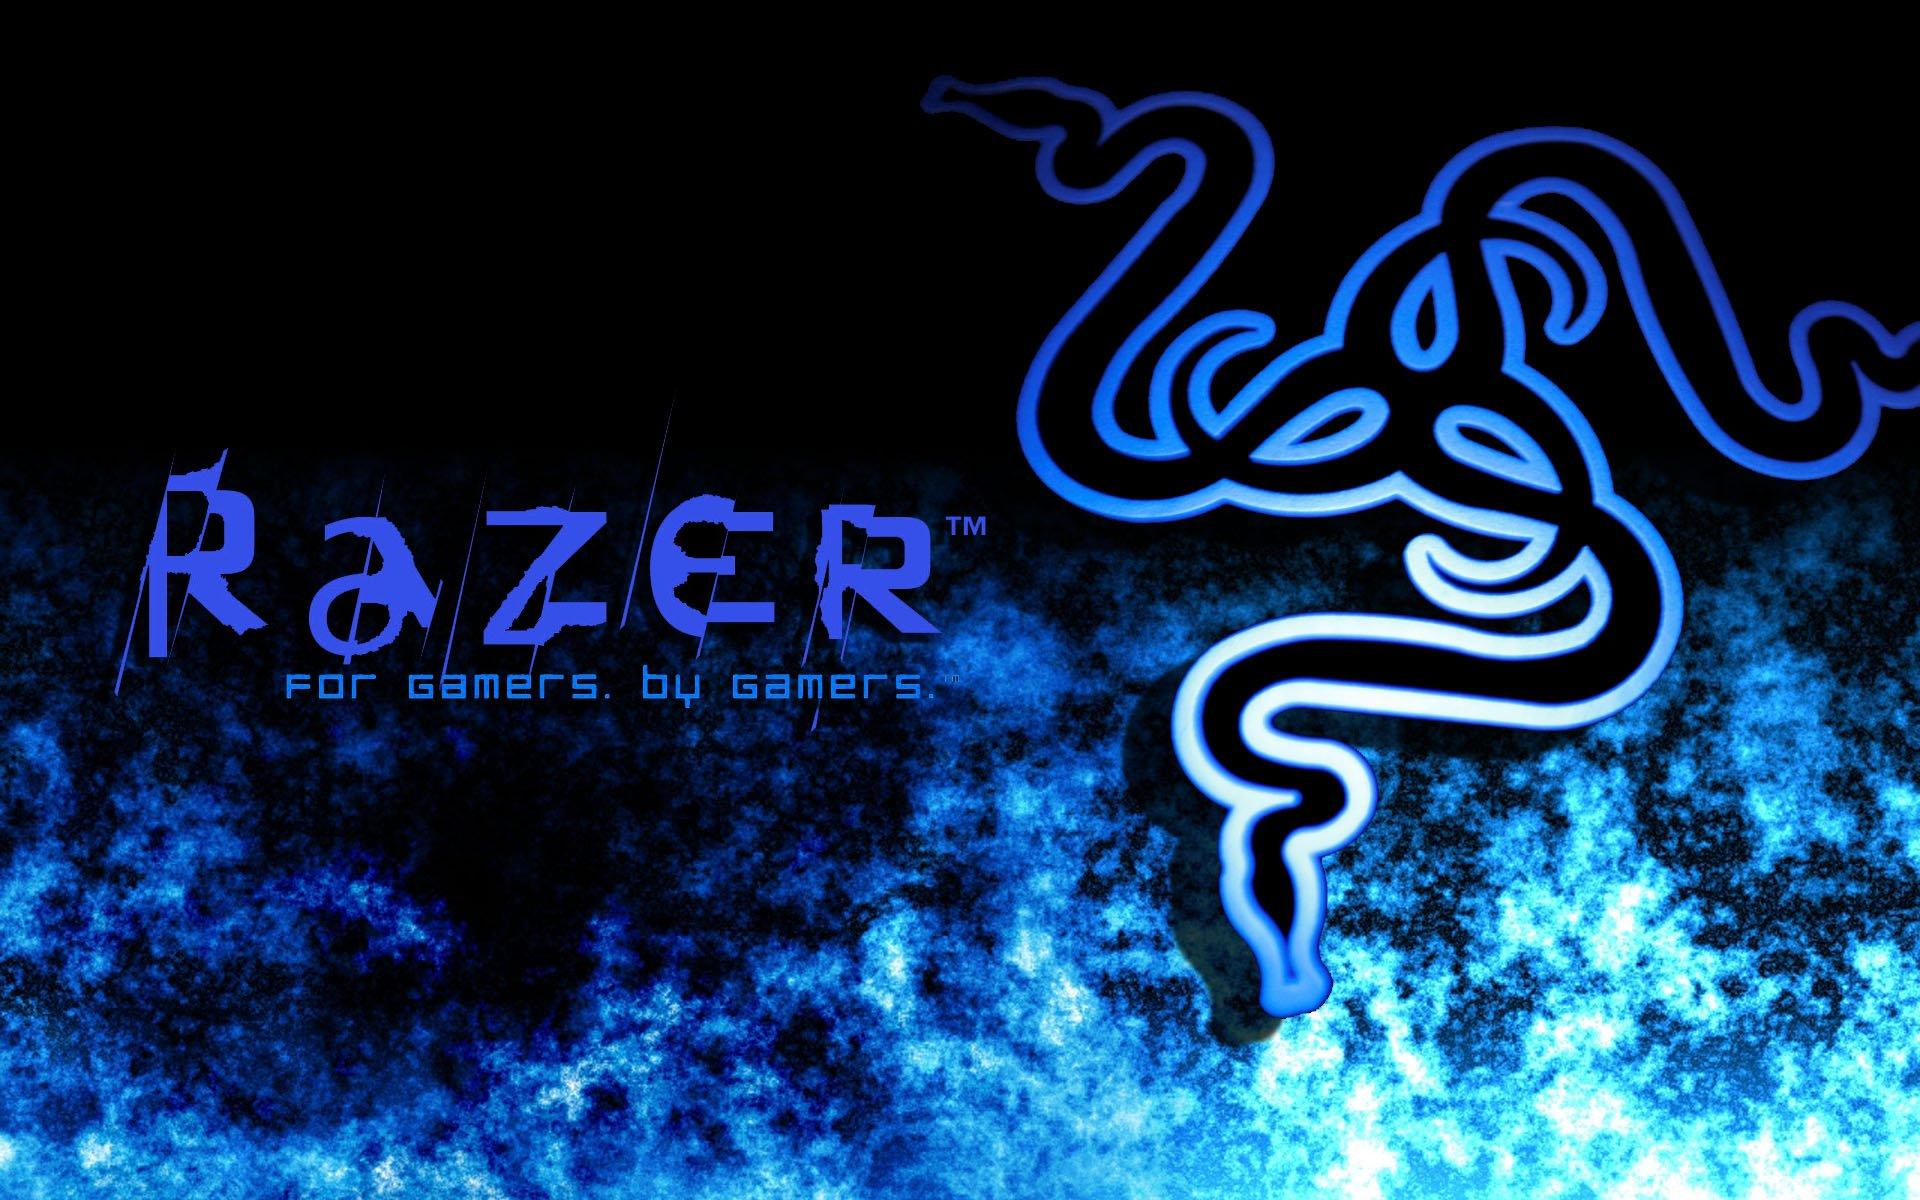 RAZER GAMING computer game wallpaper 1920x1200 400629 1920x1200